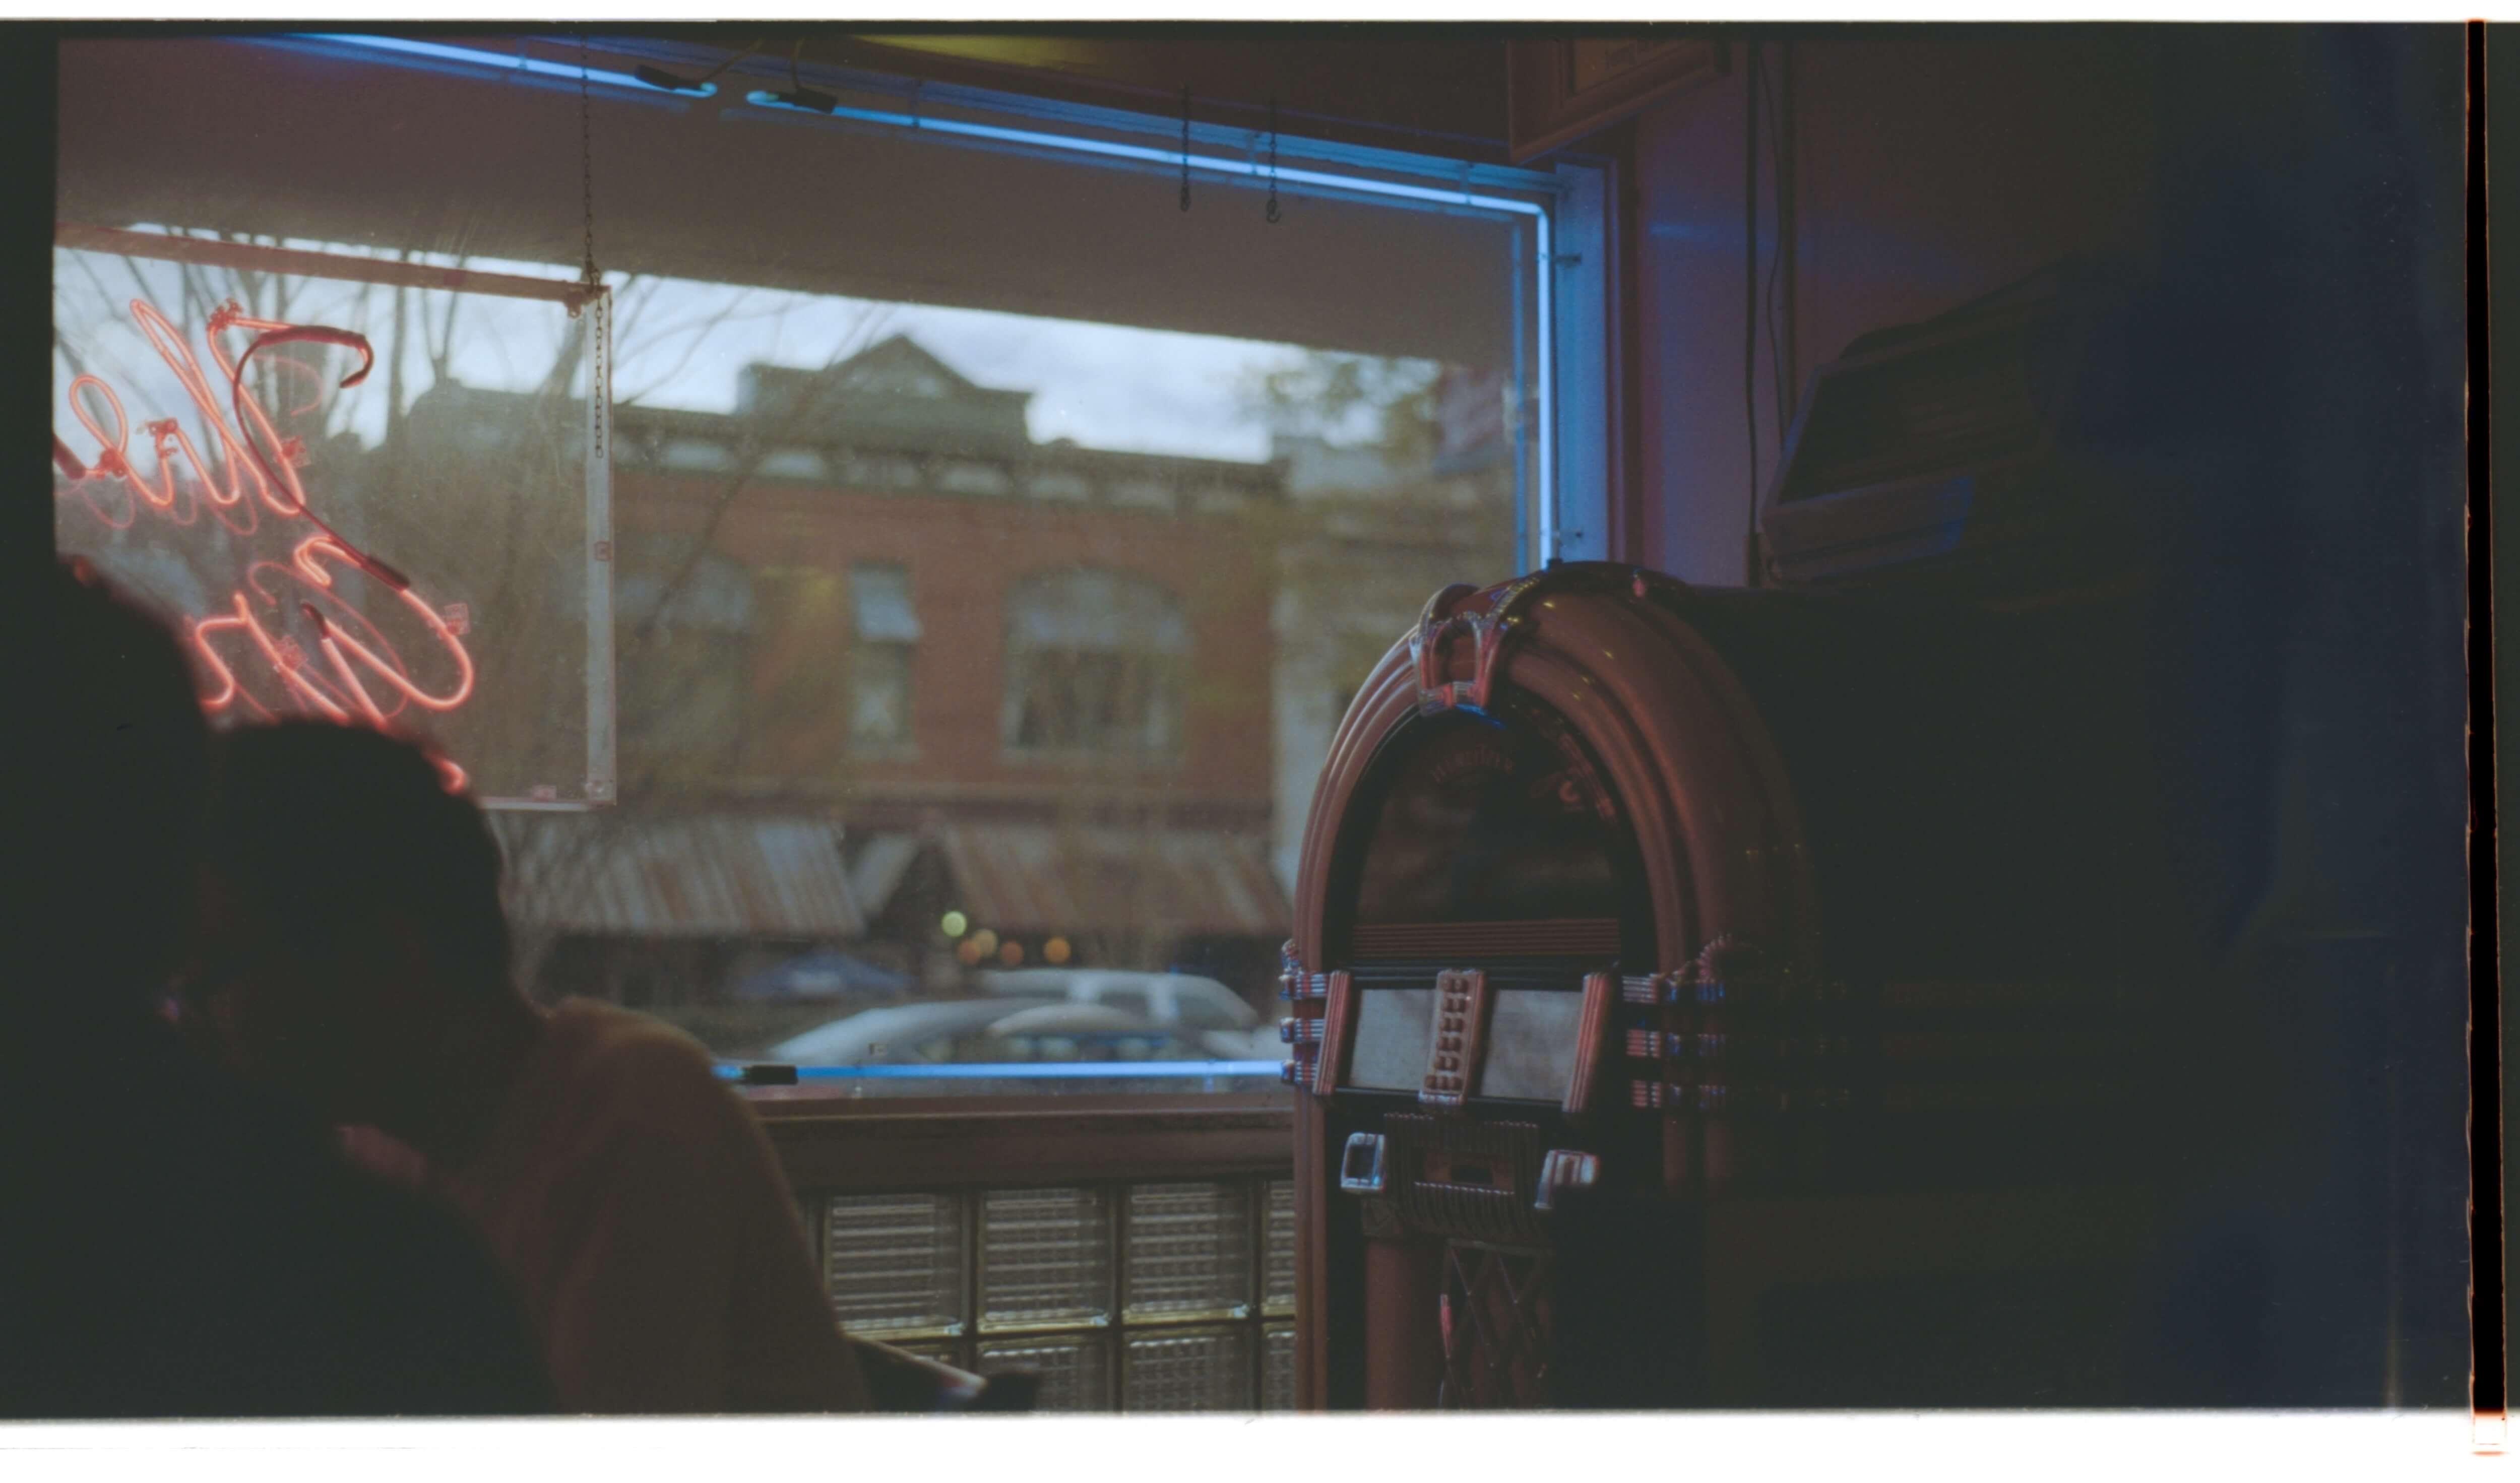 dark cafe with jukebox